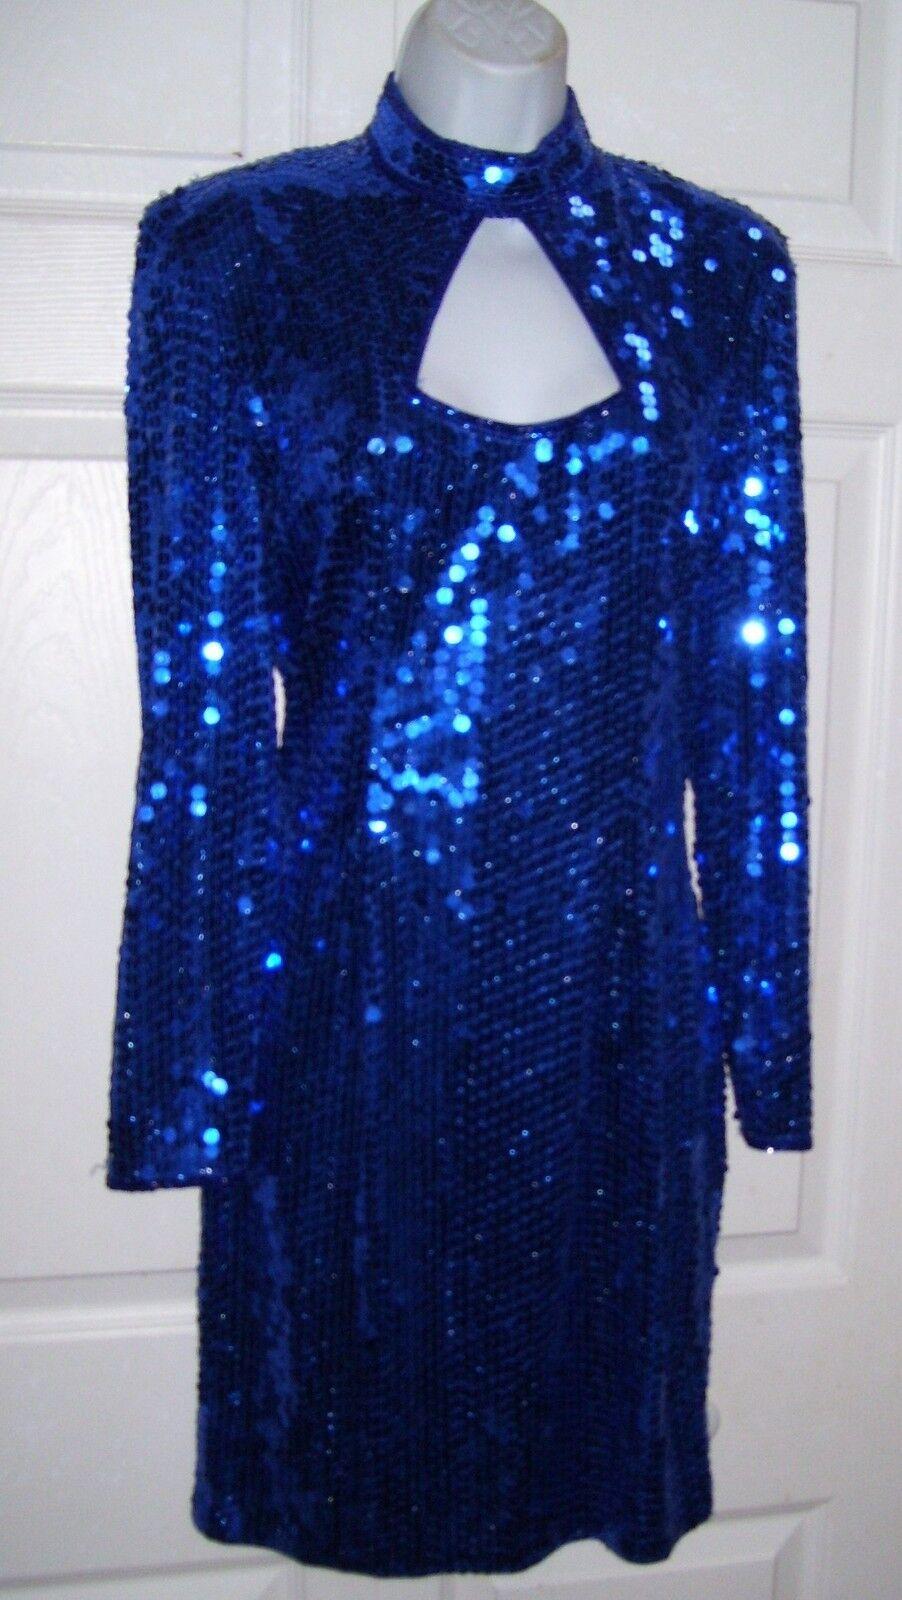 Woherren Größe 8 Medium Sequin Coverot Cocktail Dress Cobalt Retro Look Dressy